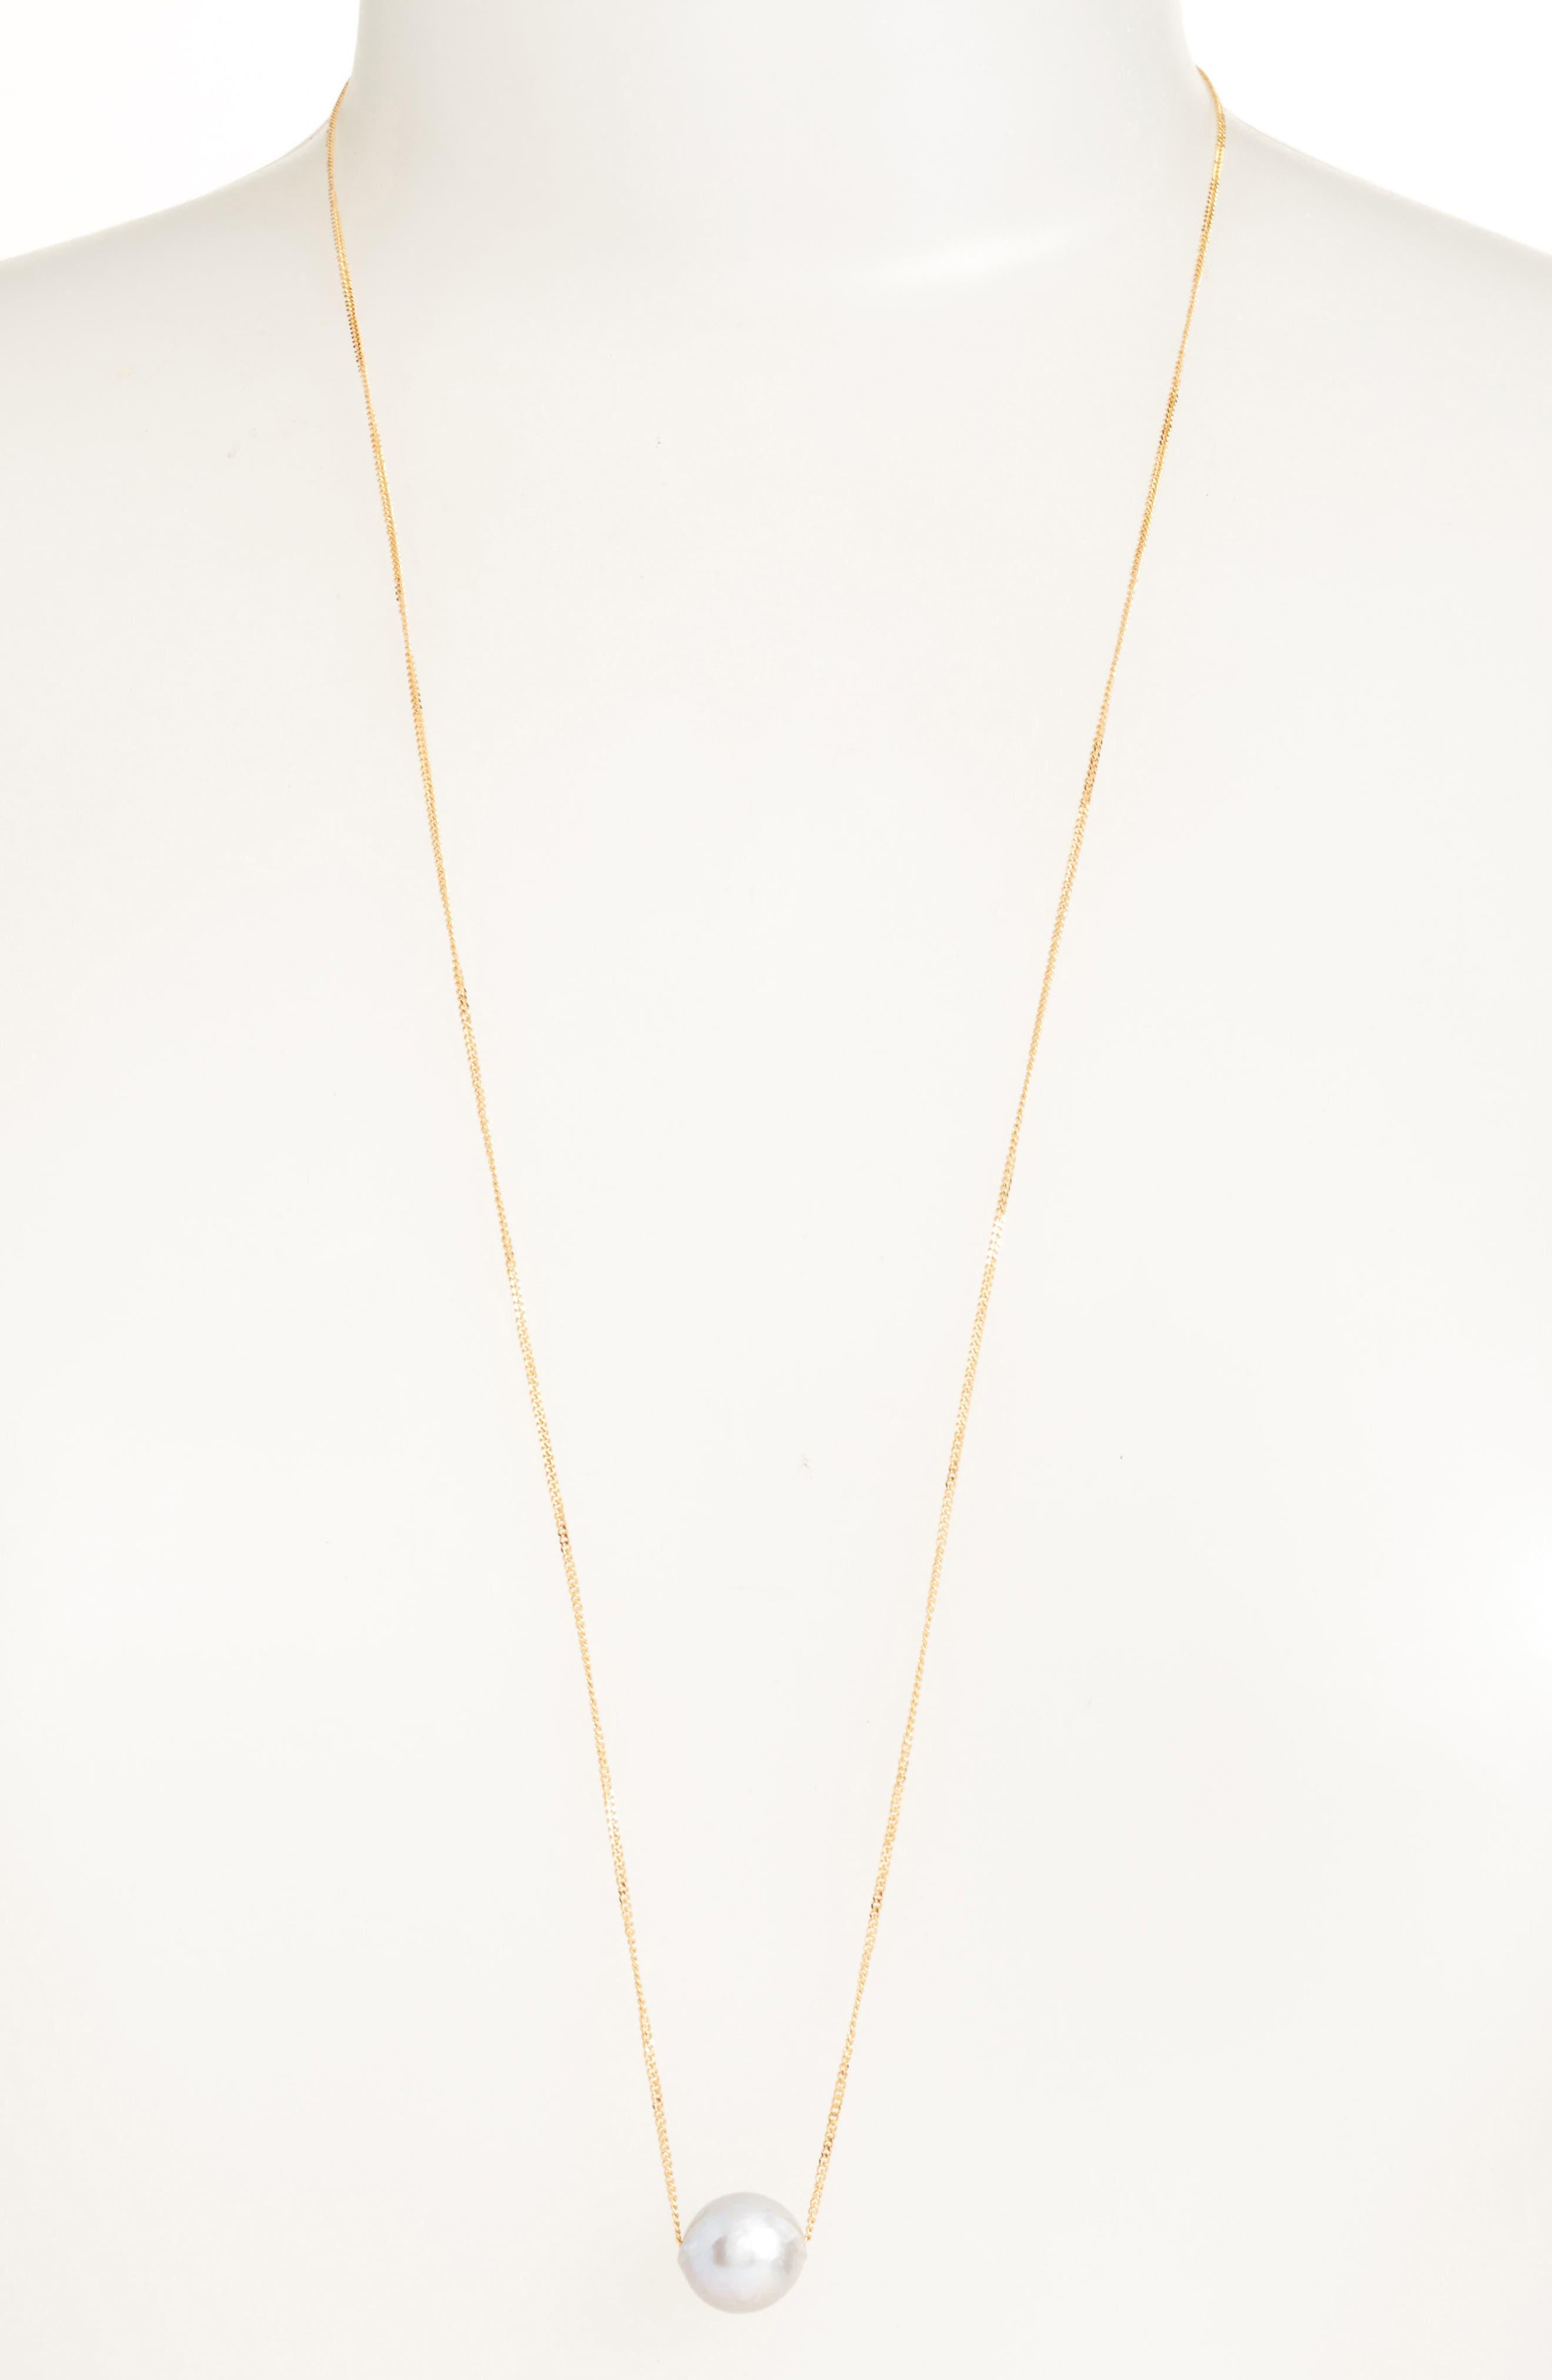 Main Image - Chan Luu Long Pearl Pendant Necklace